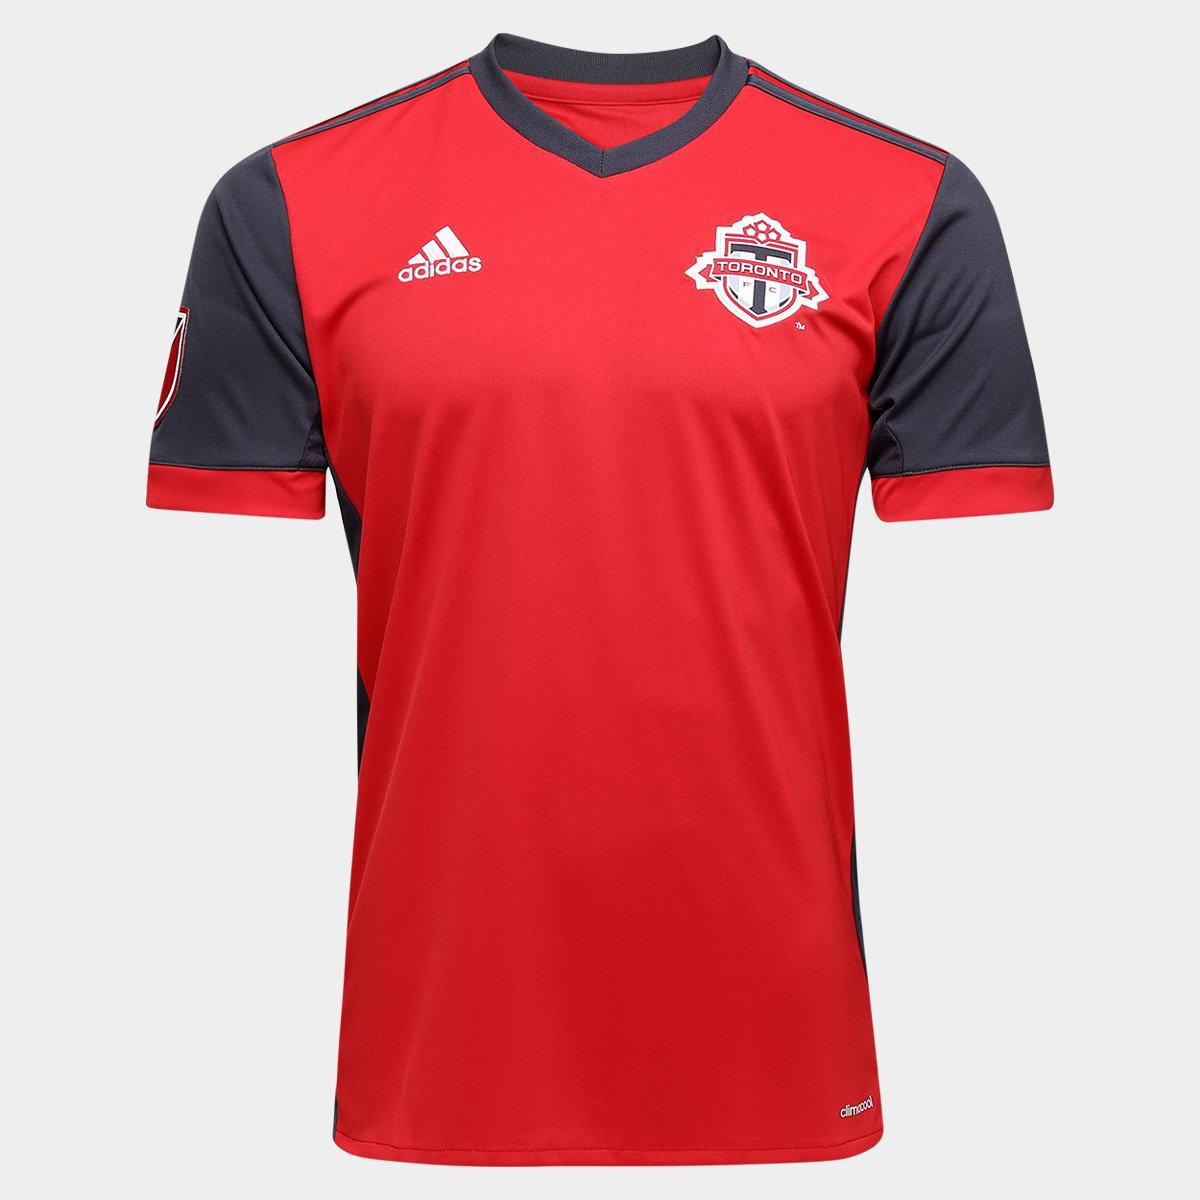 347e3e461a Camisa Toronto MLS Home 17 18 s nº Torcedor Adidas Masculina